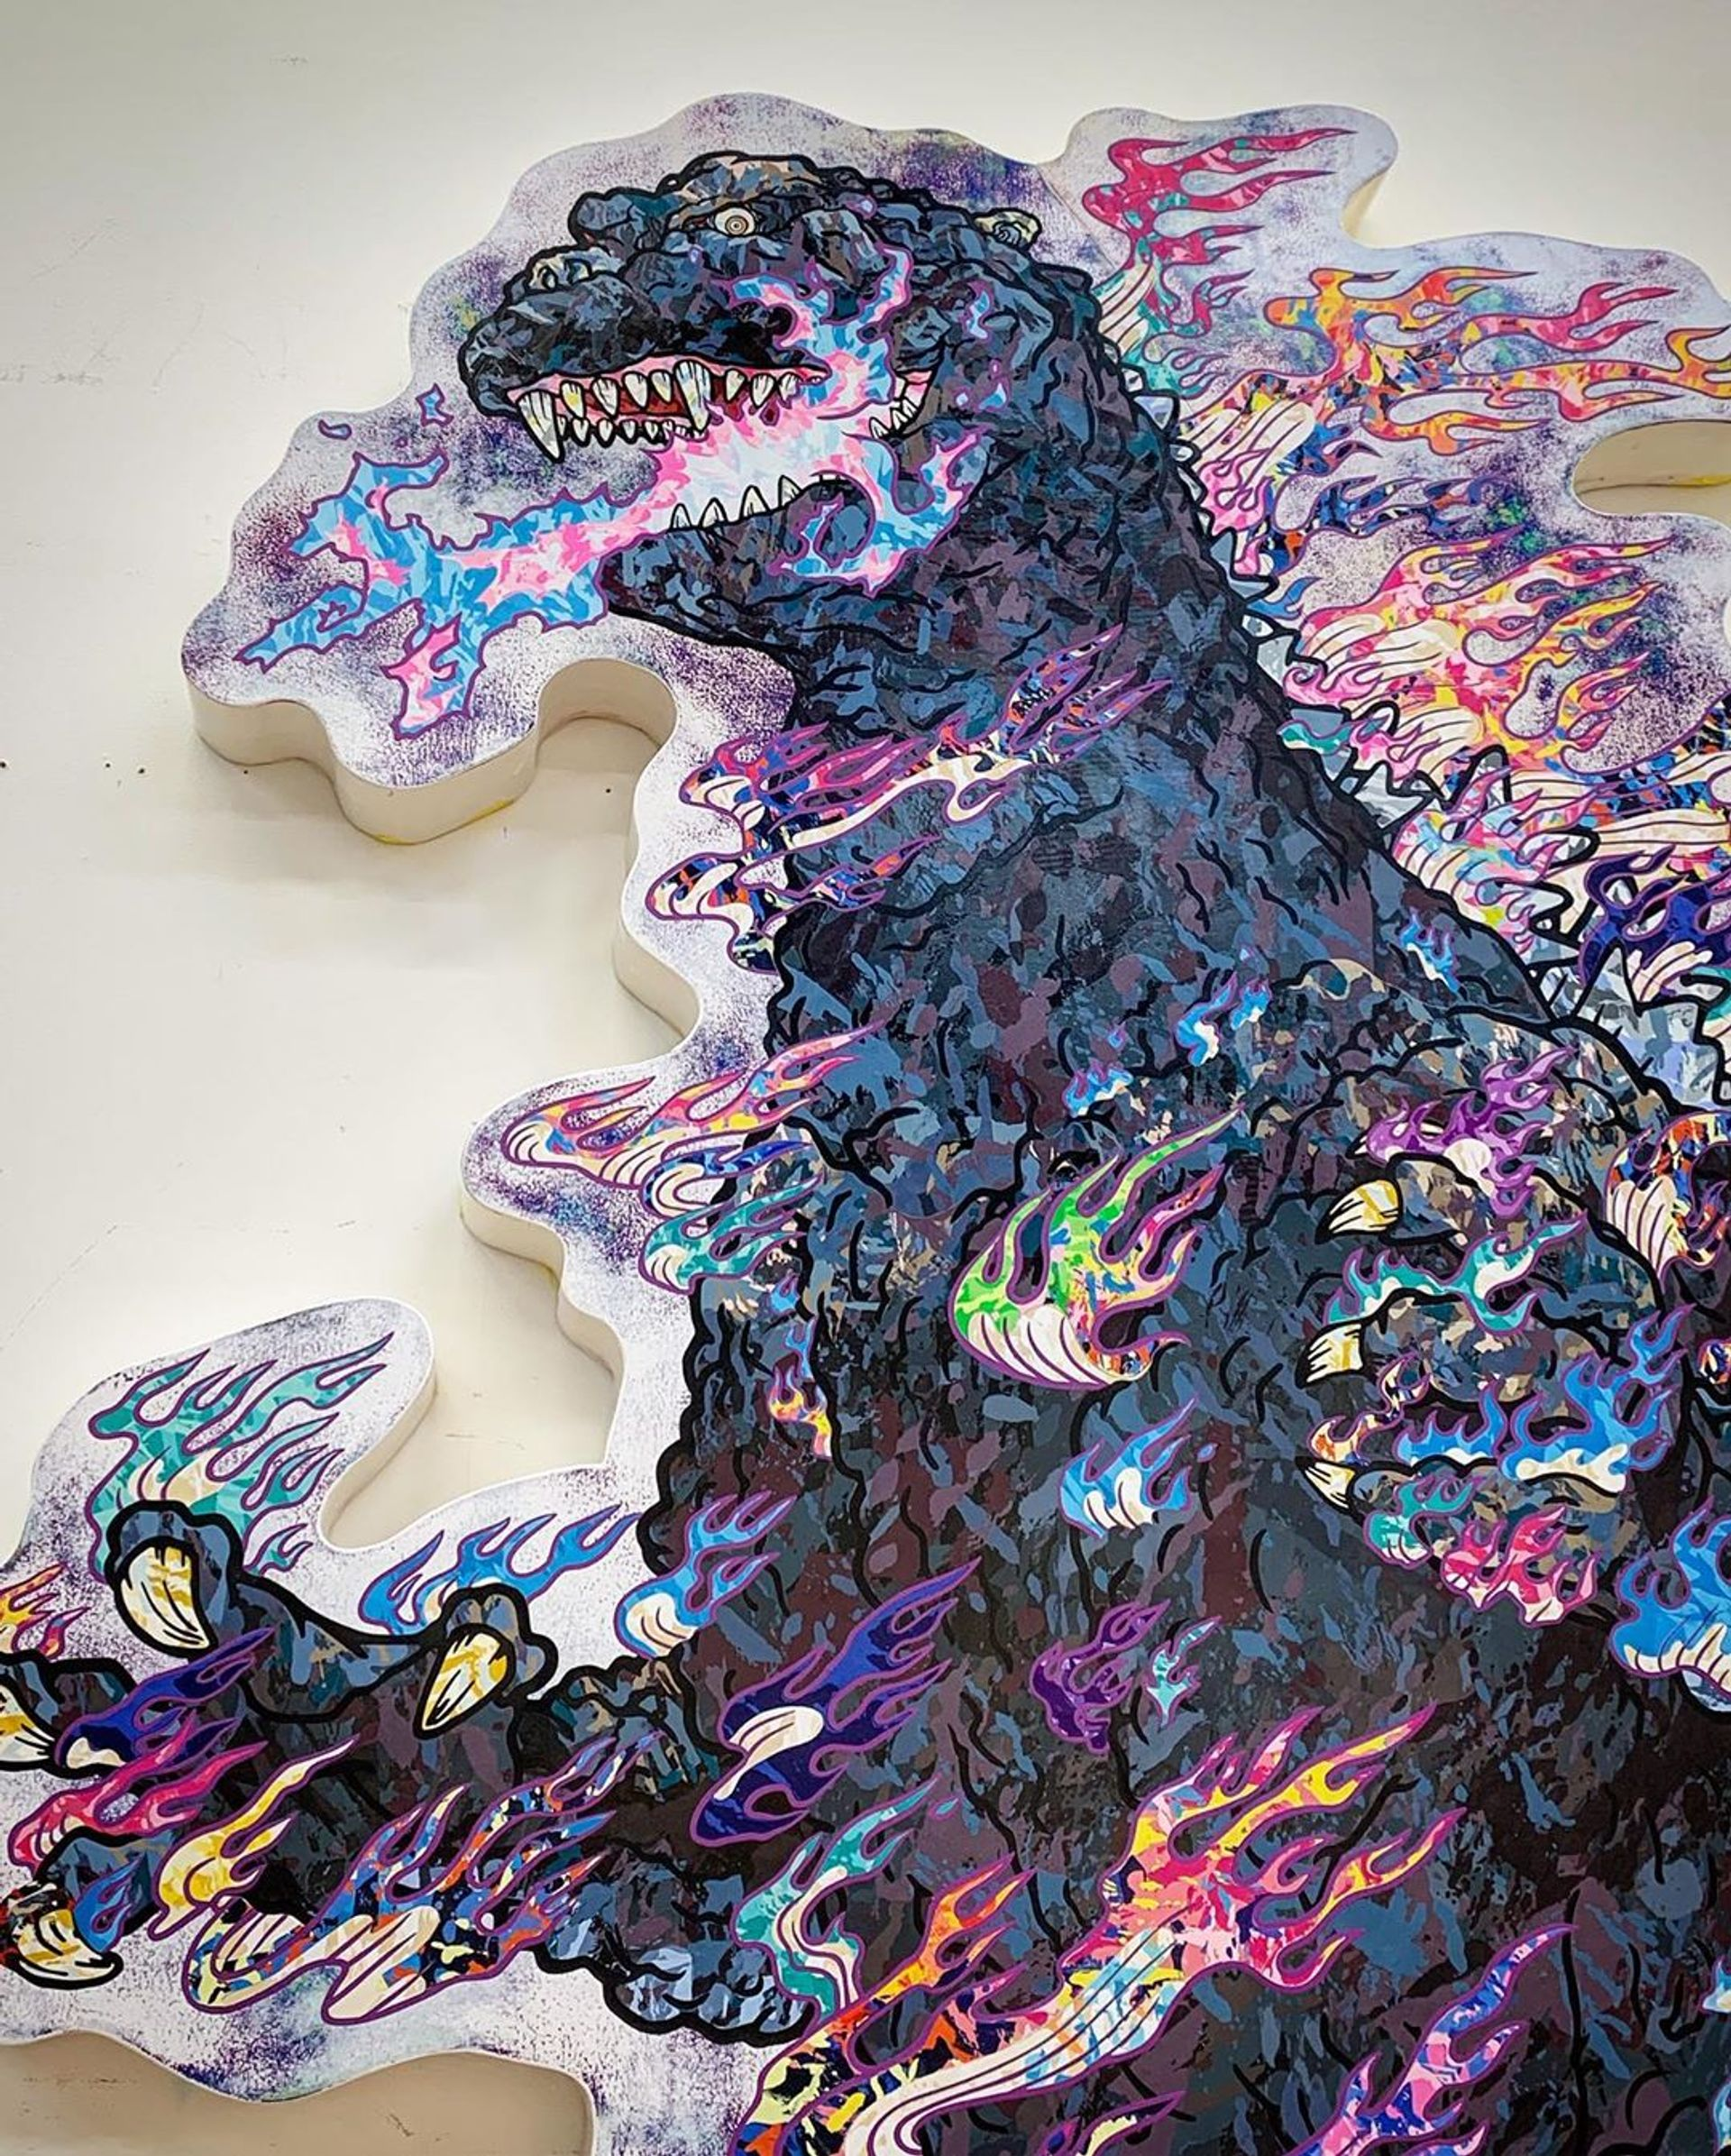 Murakami's portrait of Godzilla wreathed in flames © Takashi Murakami